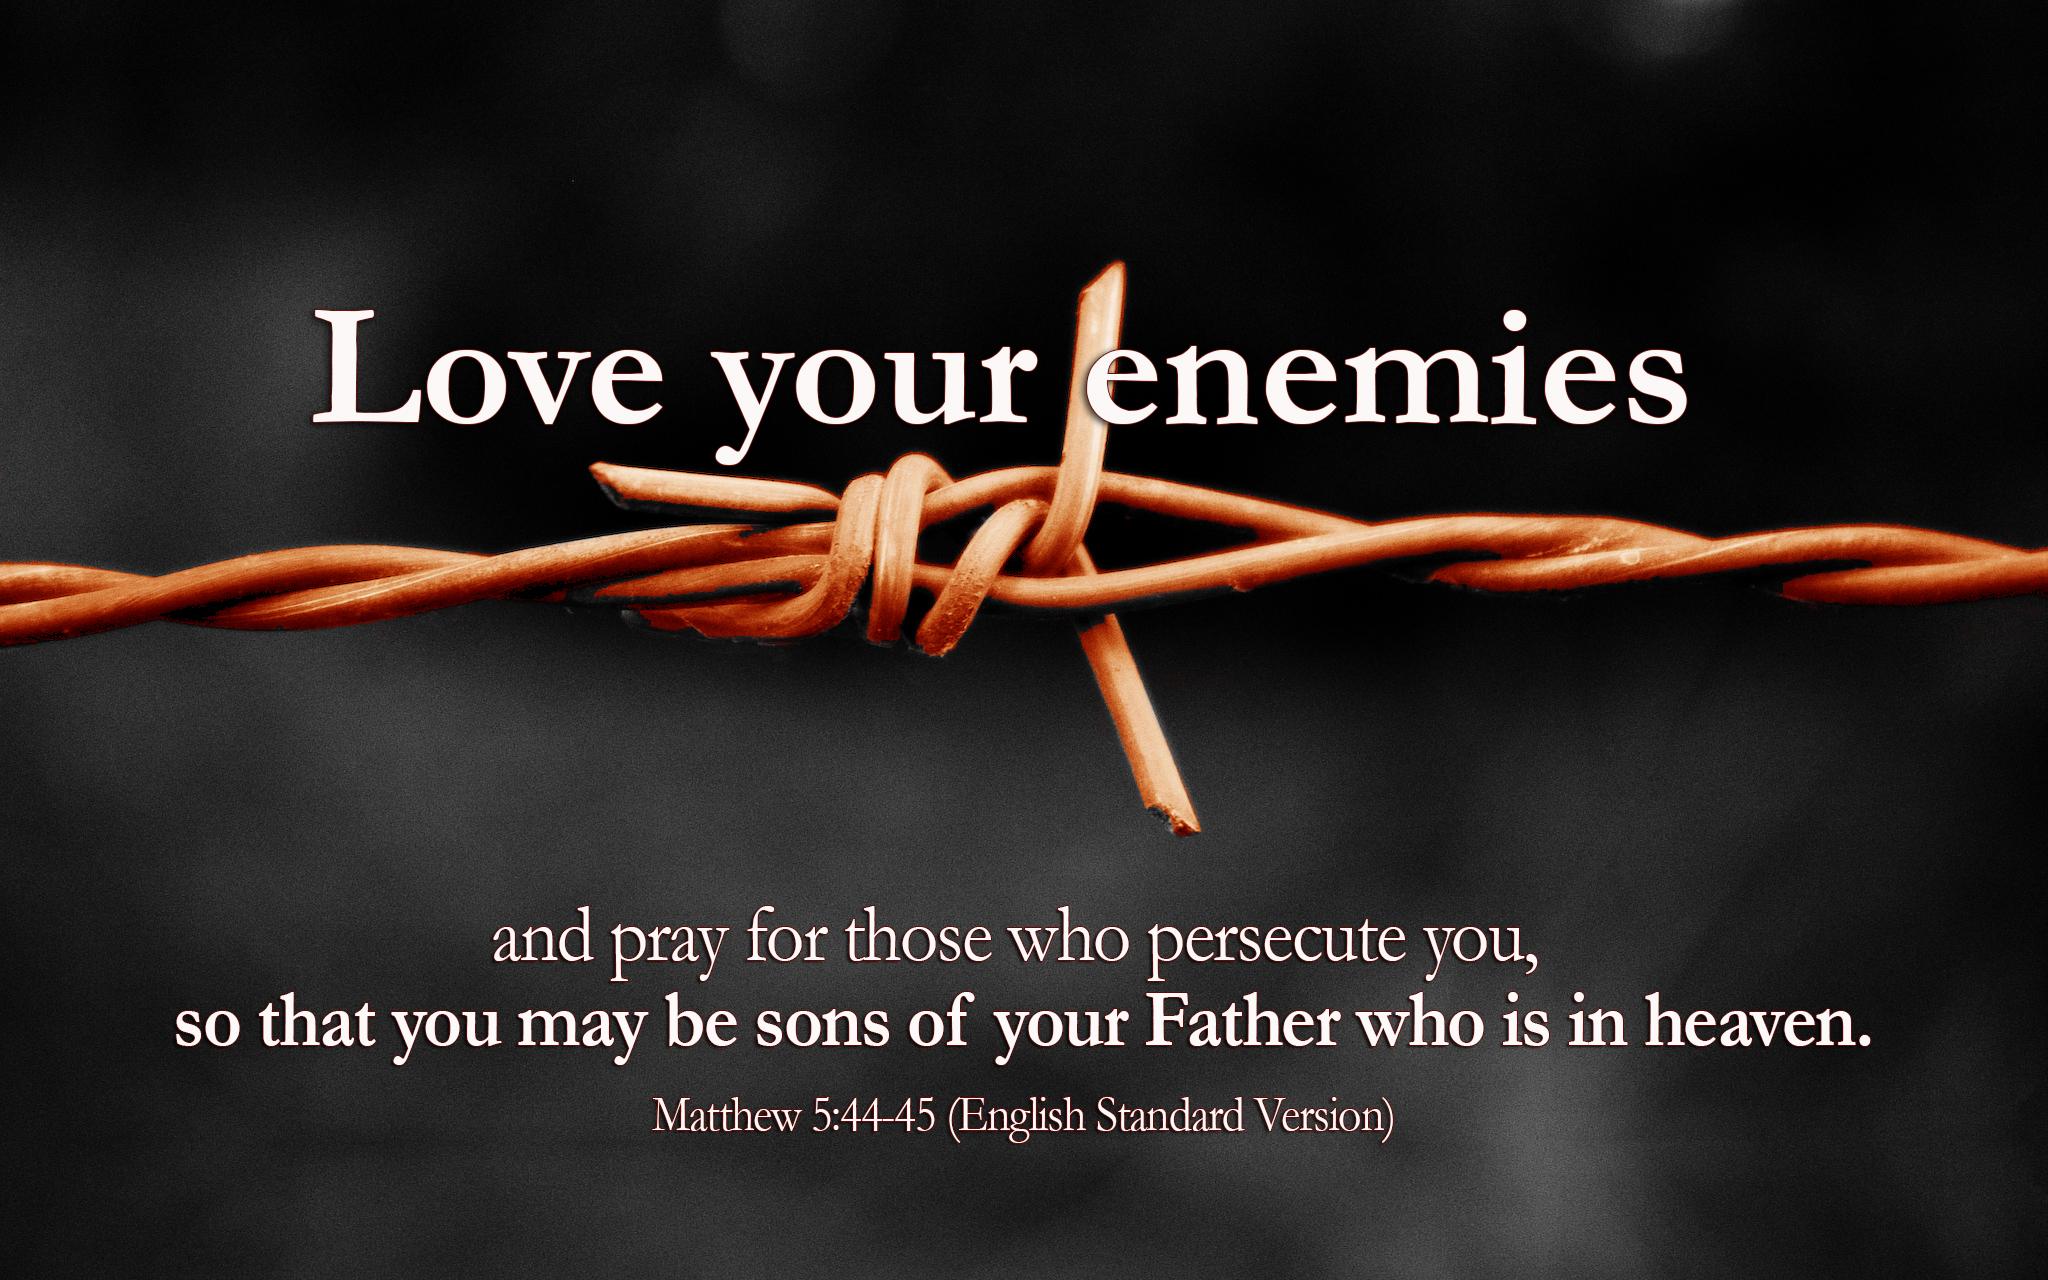 Matthew 5:44-45 - The Fellowship Site